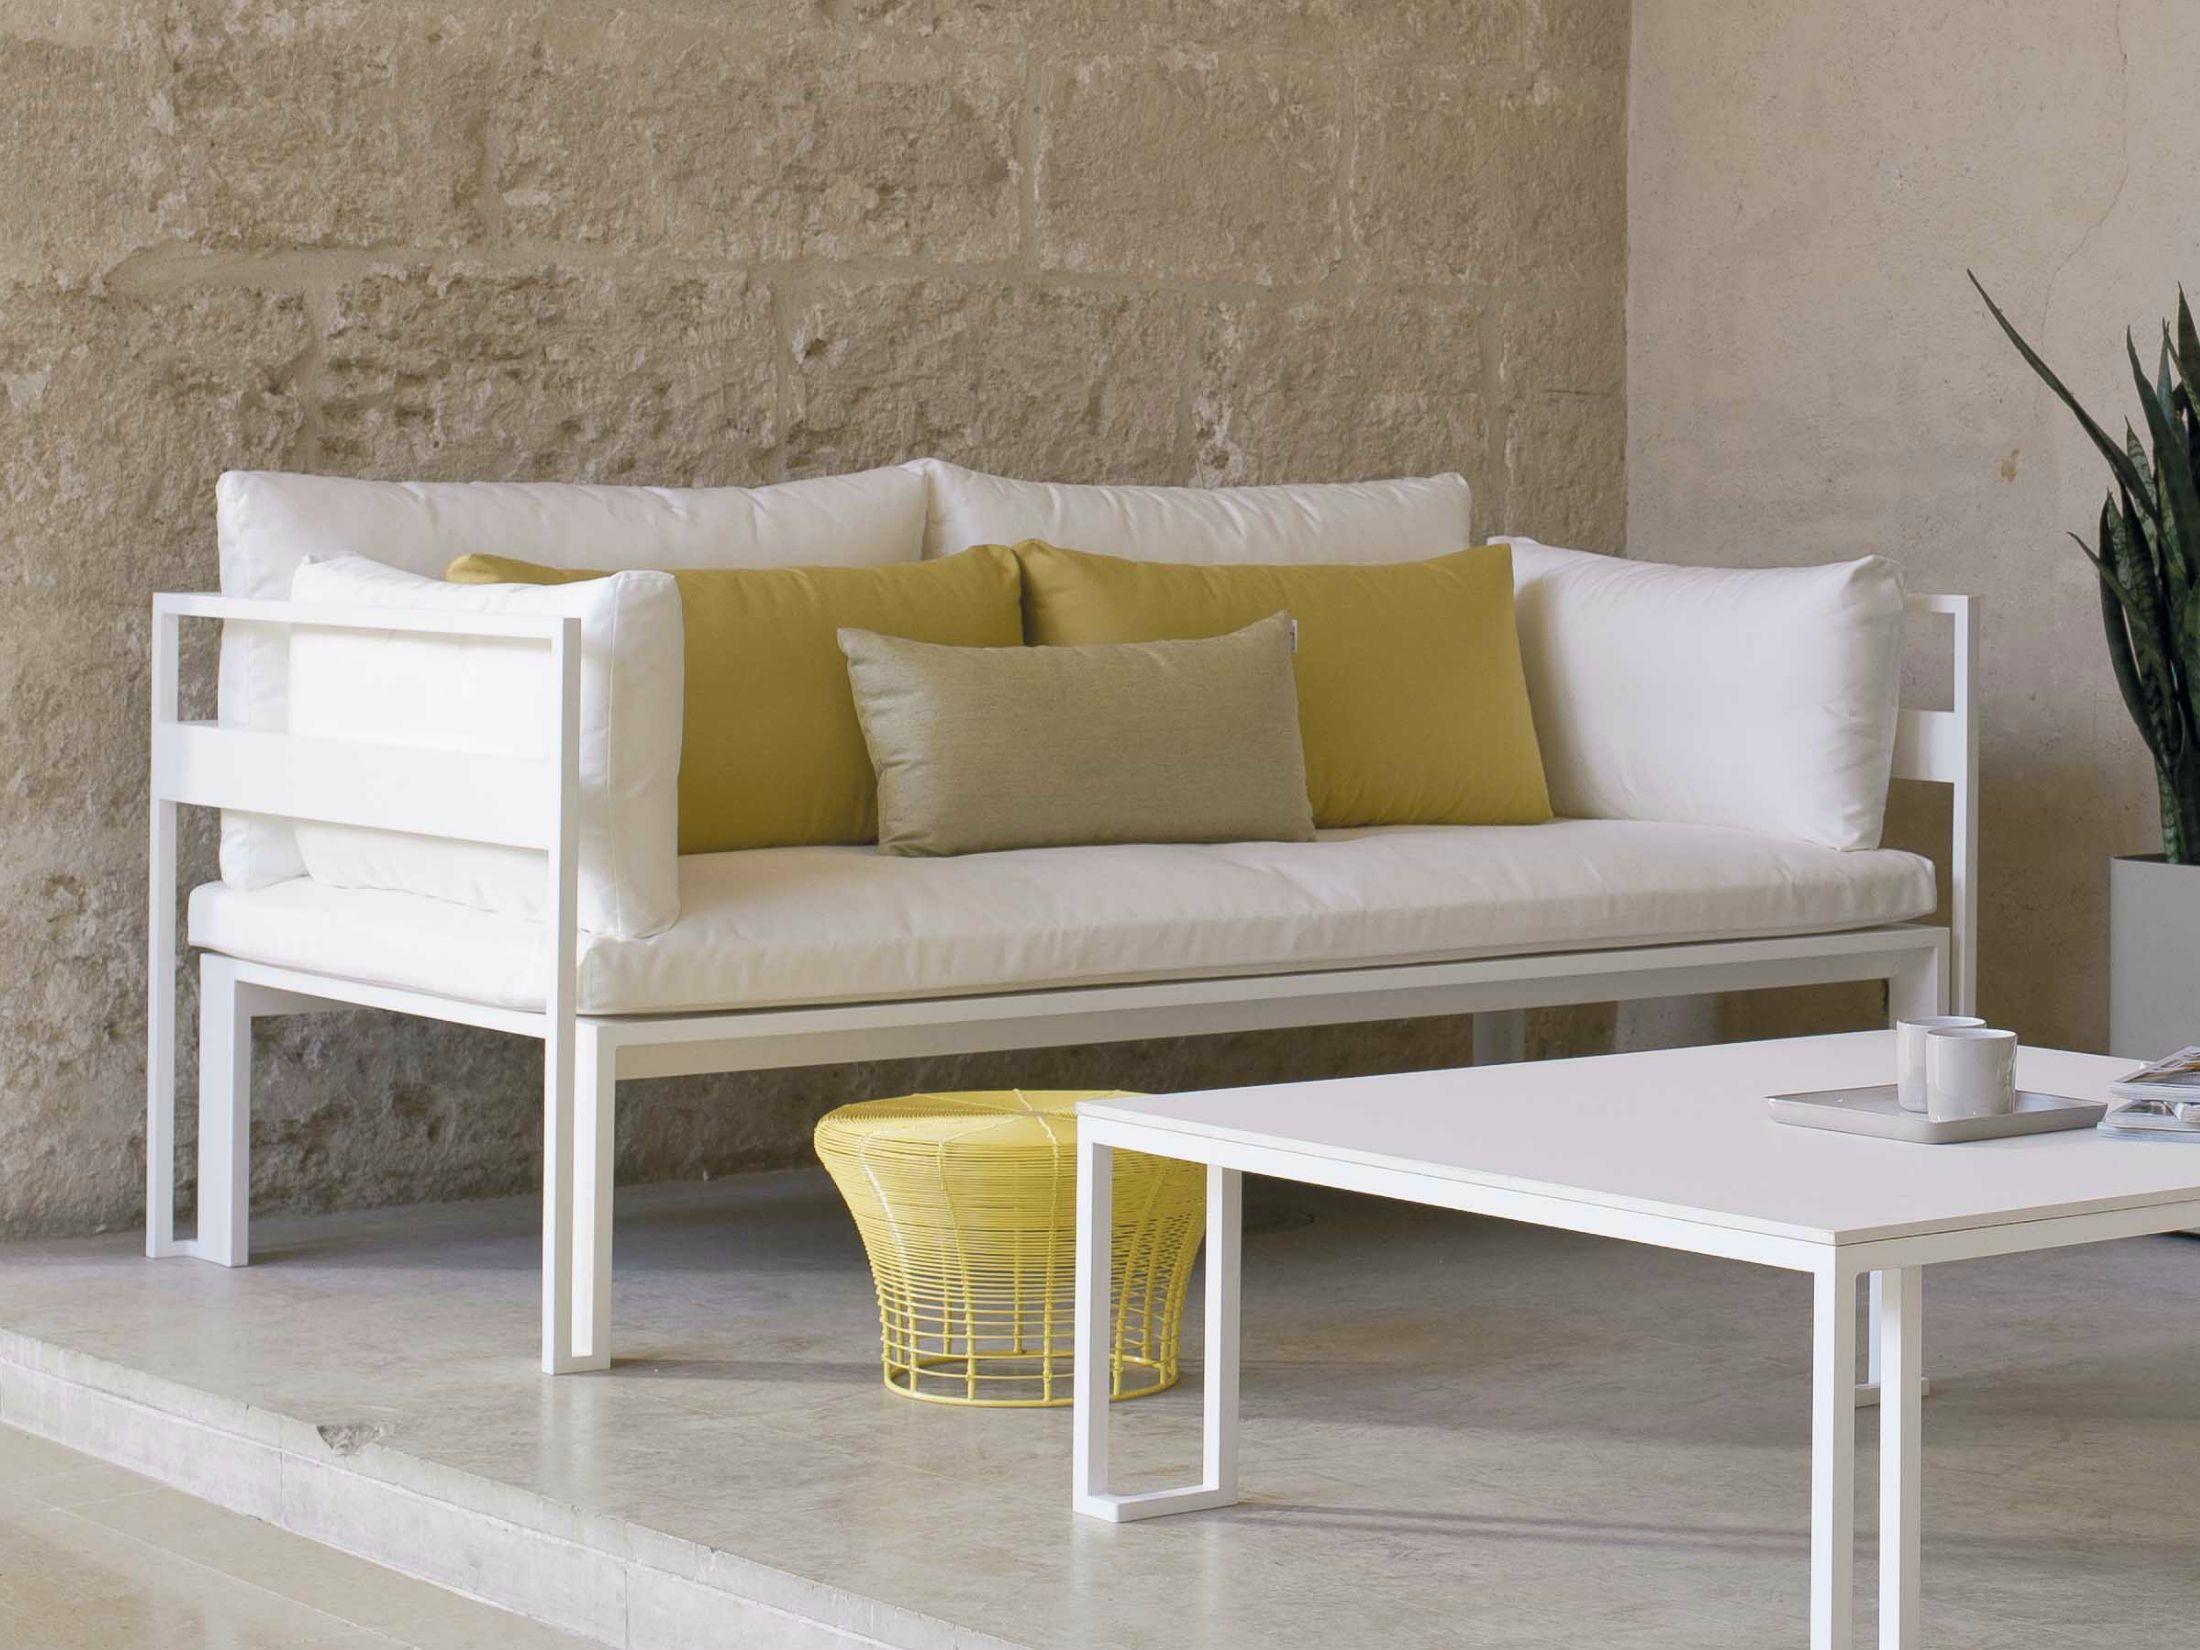 Jian divano by gandia blasco design neri hu design and for Divanetti giardino